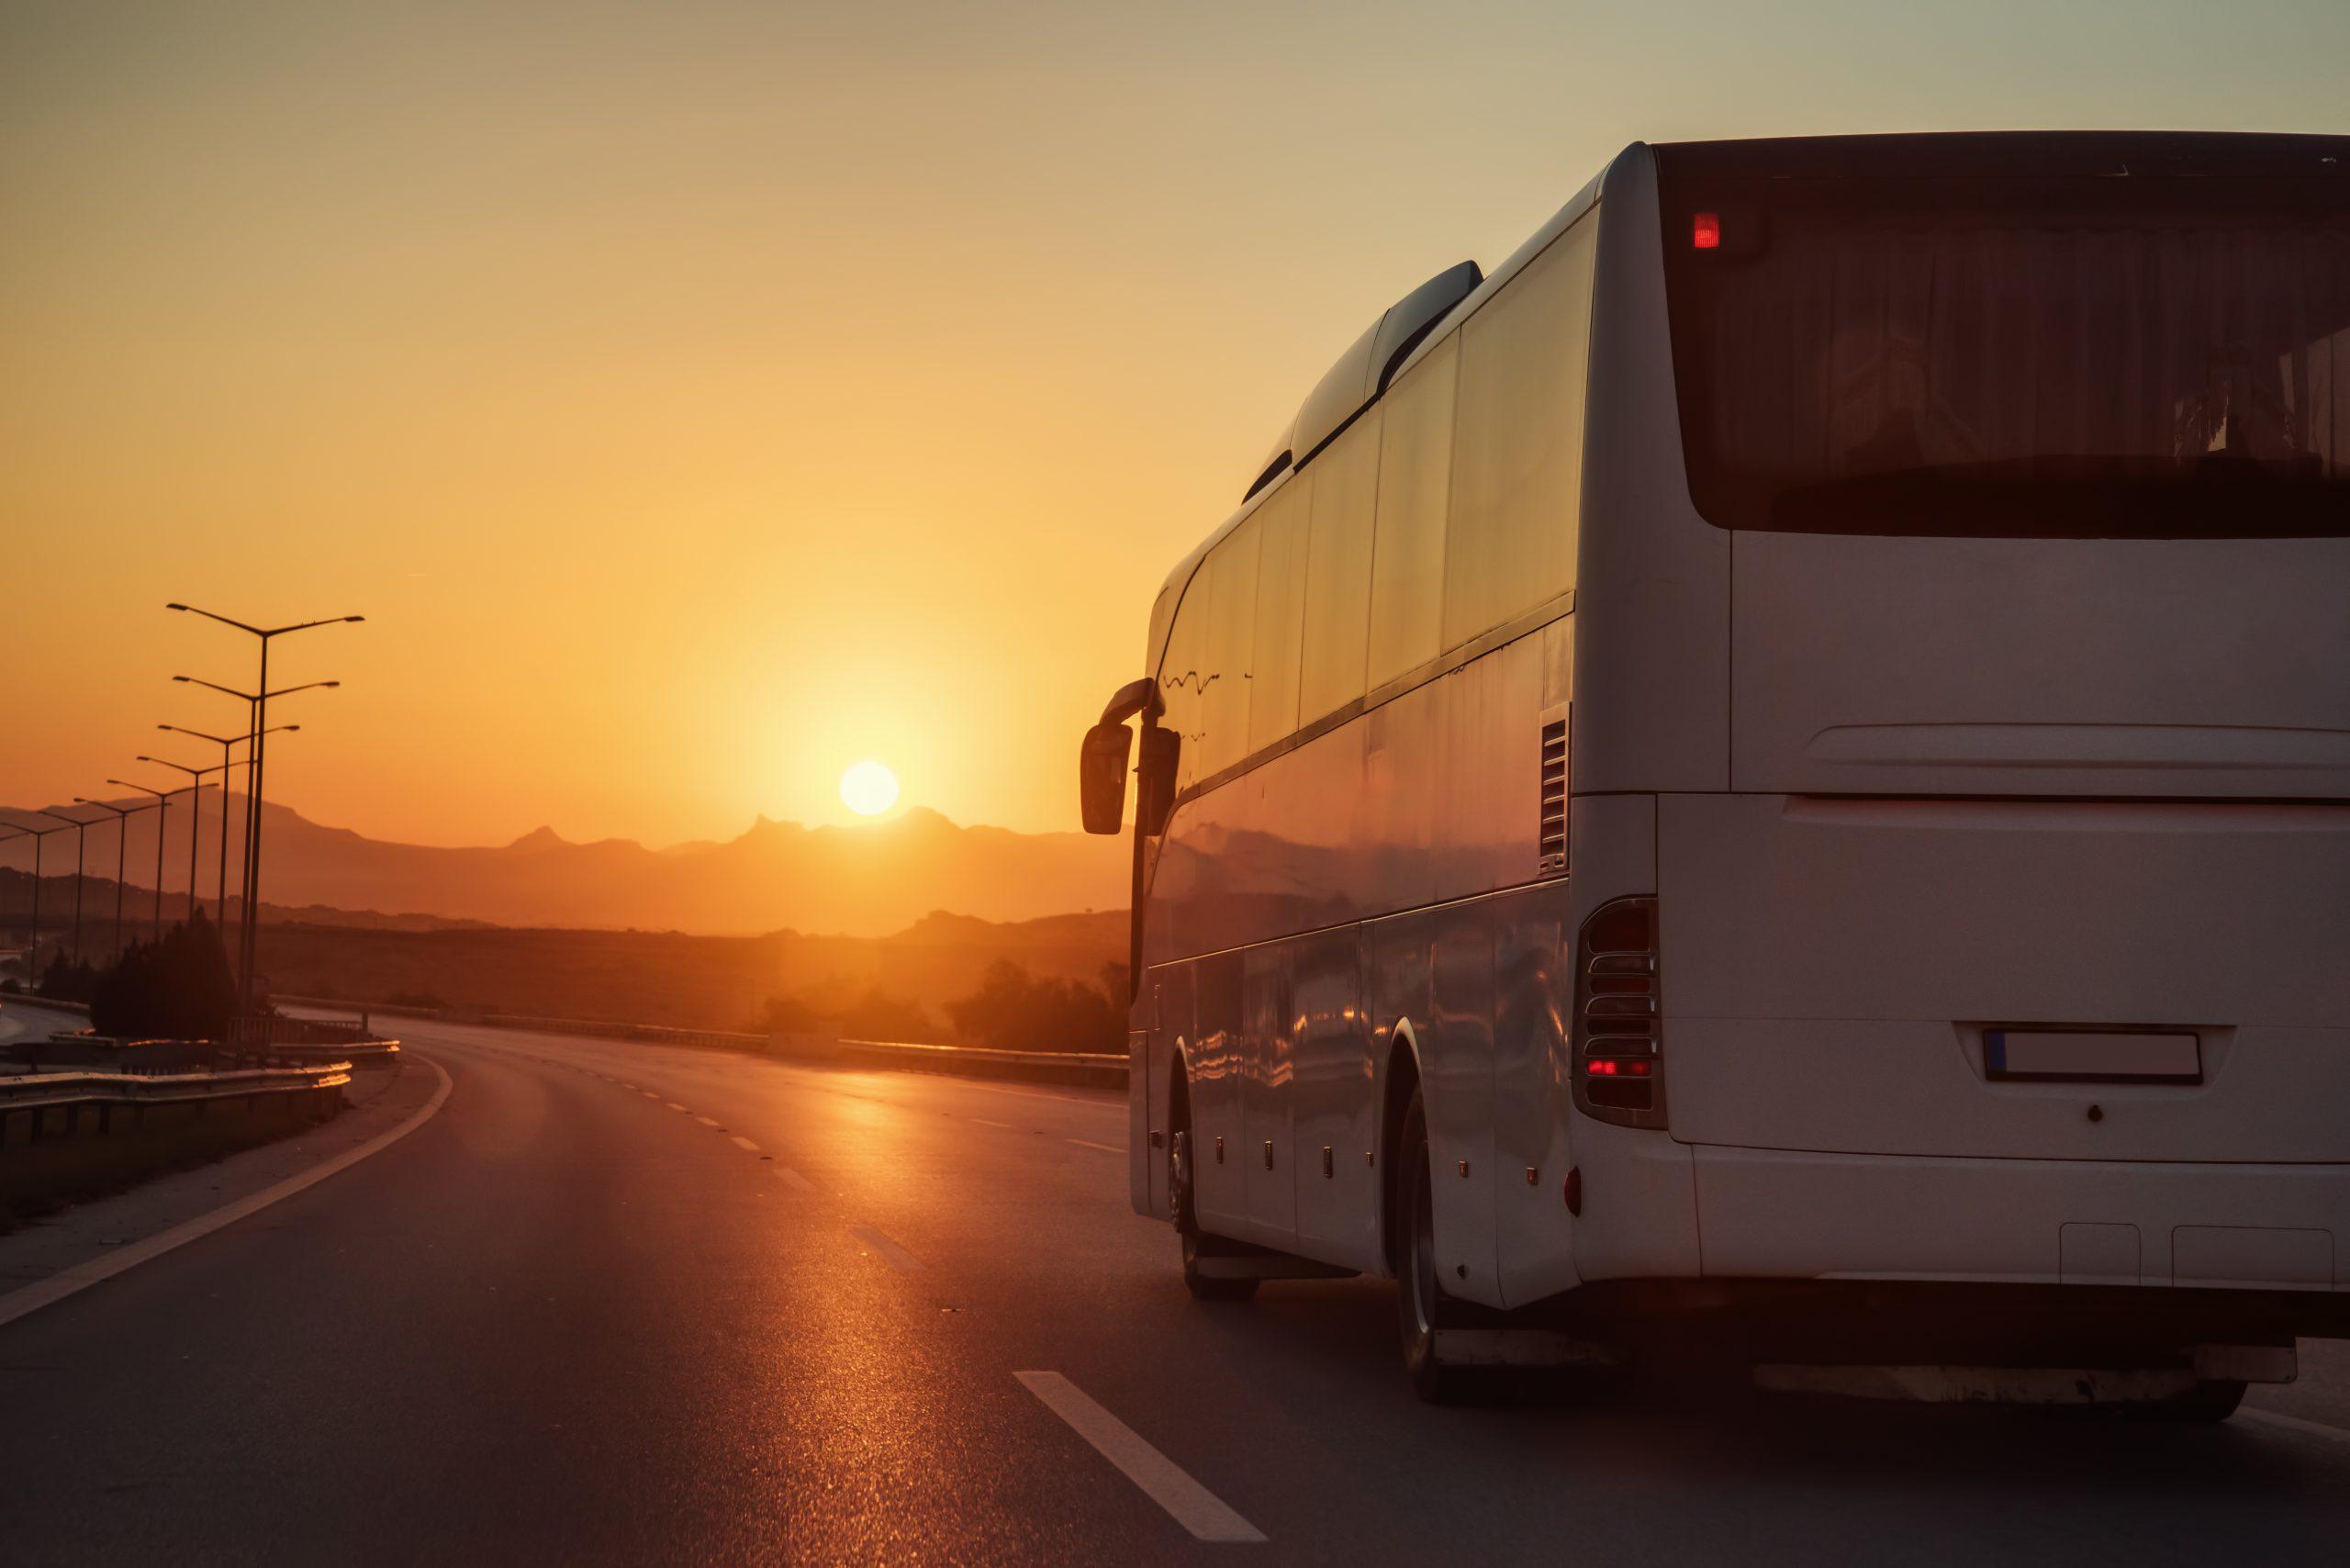 Coronavírus: ANTT atualiza medidas para viagens de ônibus